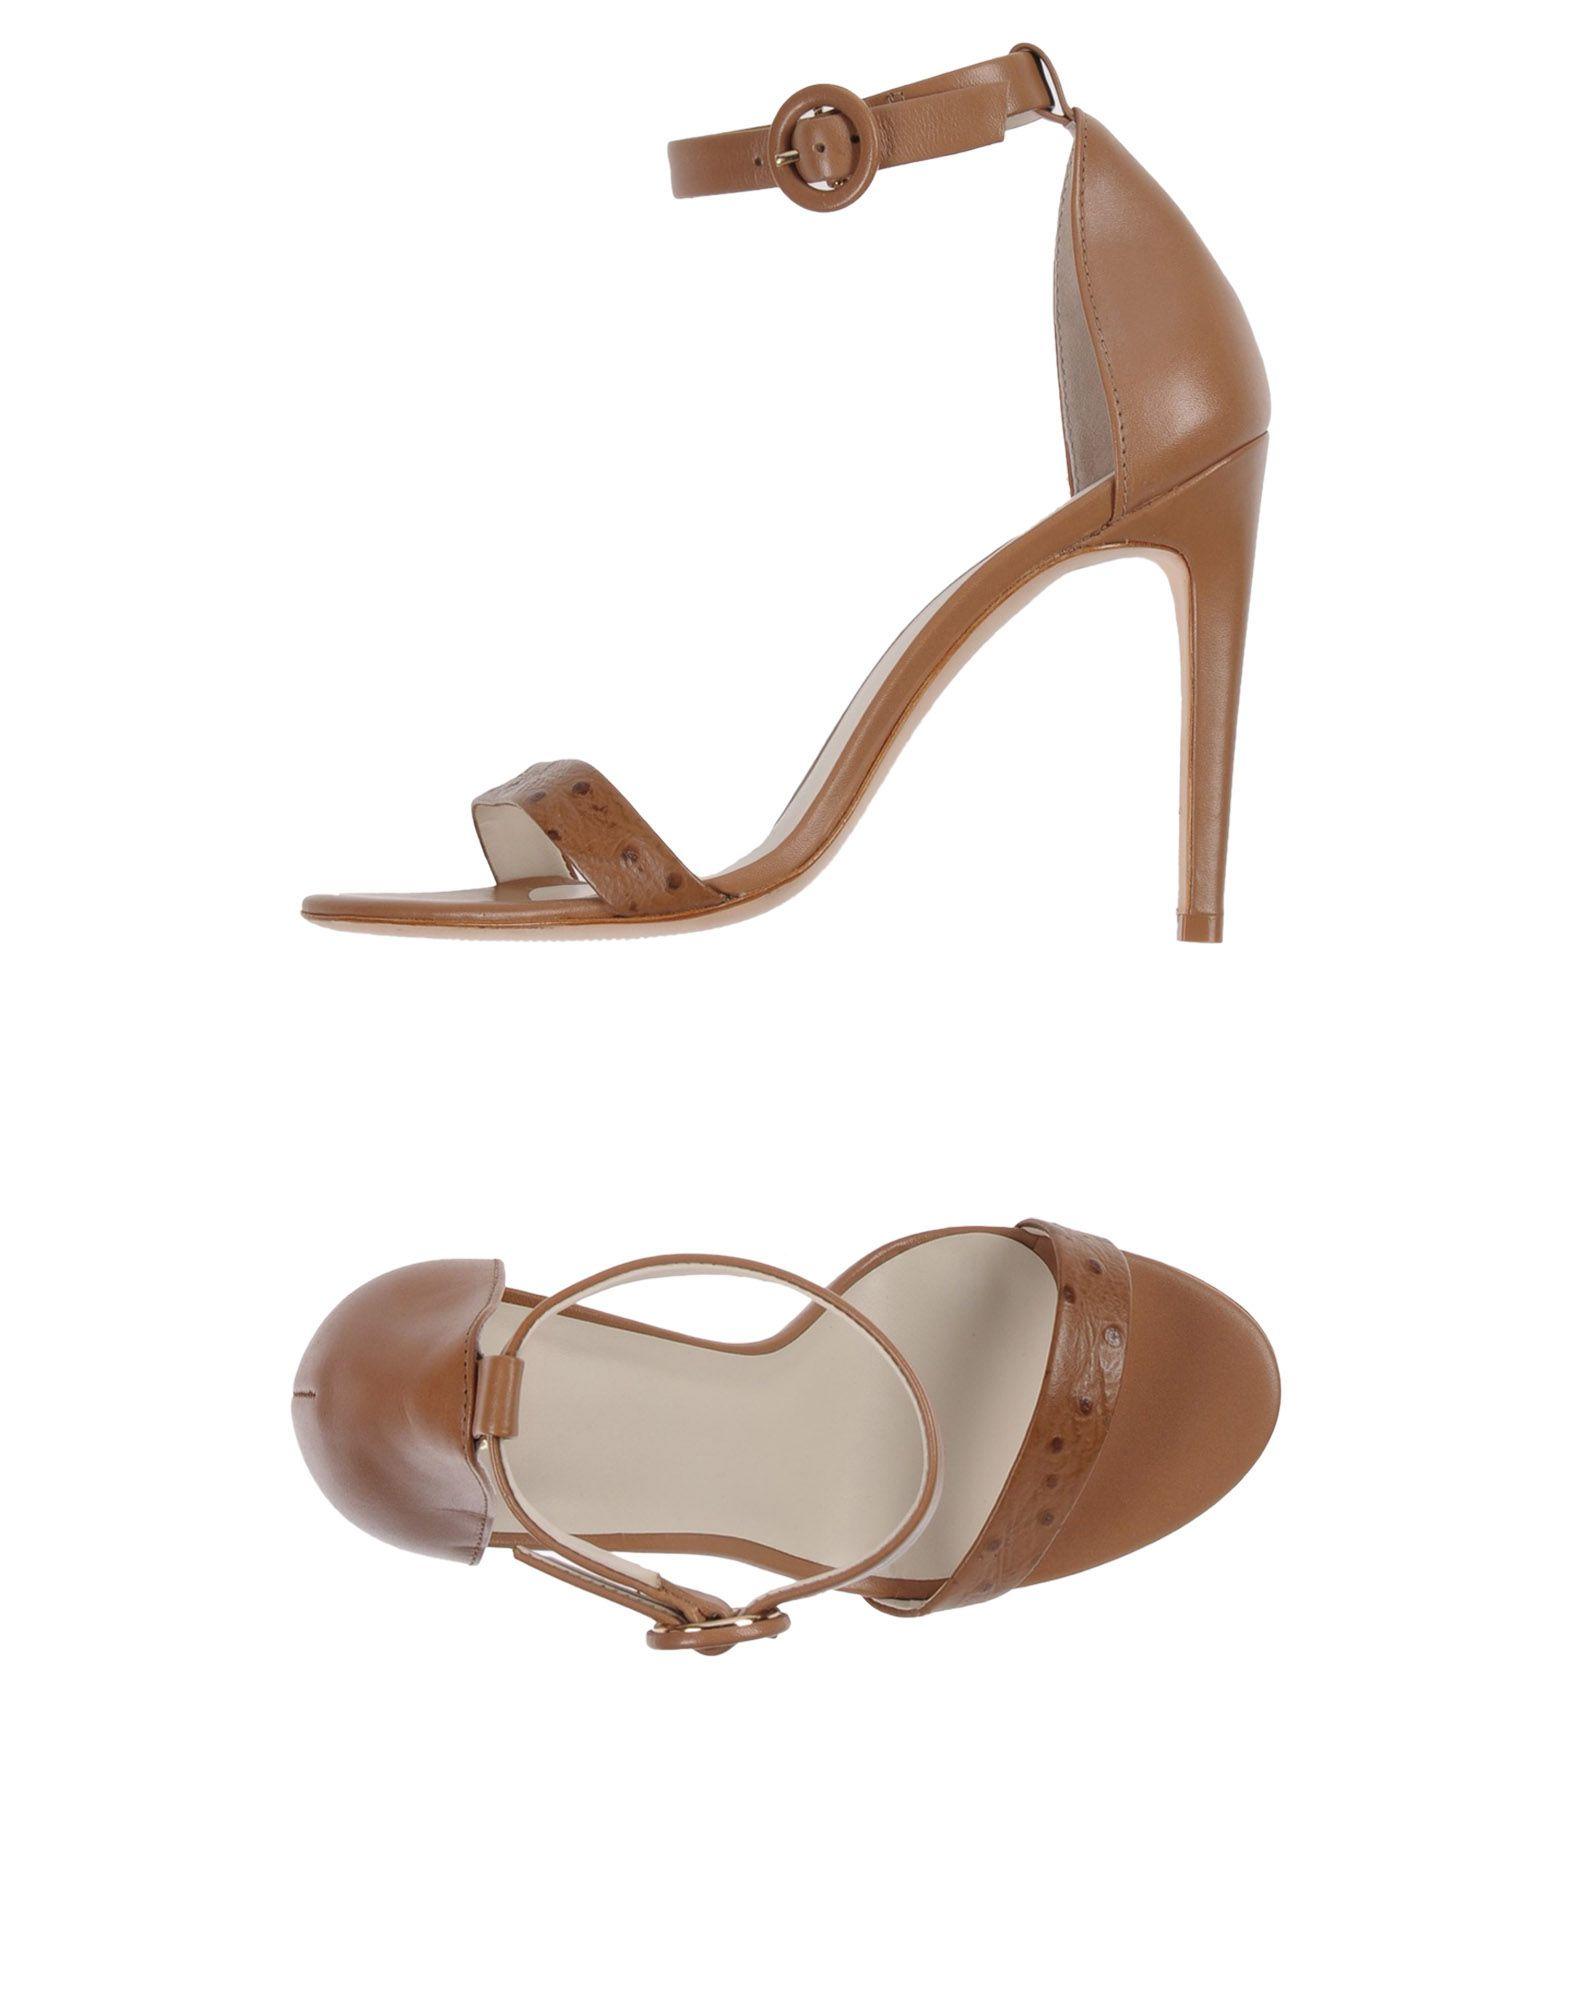 Iris & Ink Sandalen Damen  11434450FO Gute Qualität beliebte Schuhe